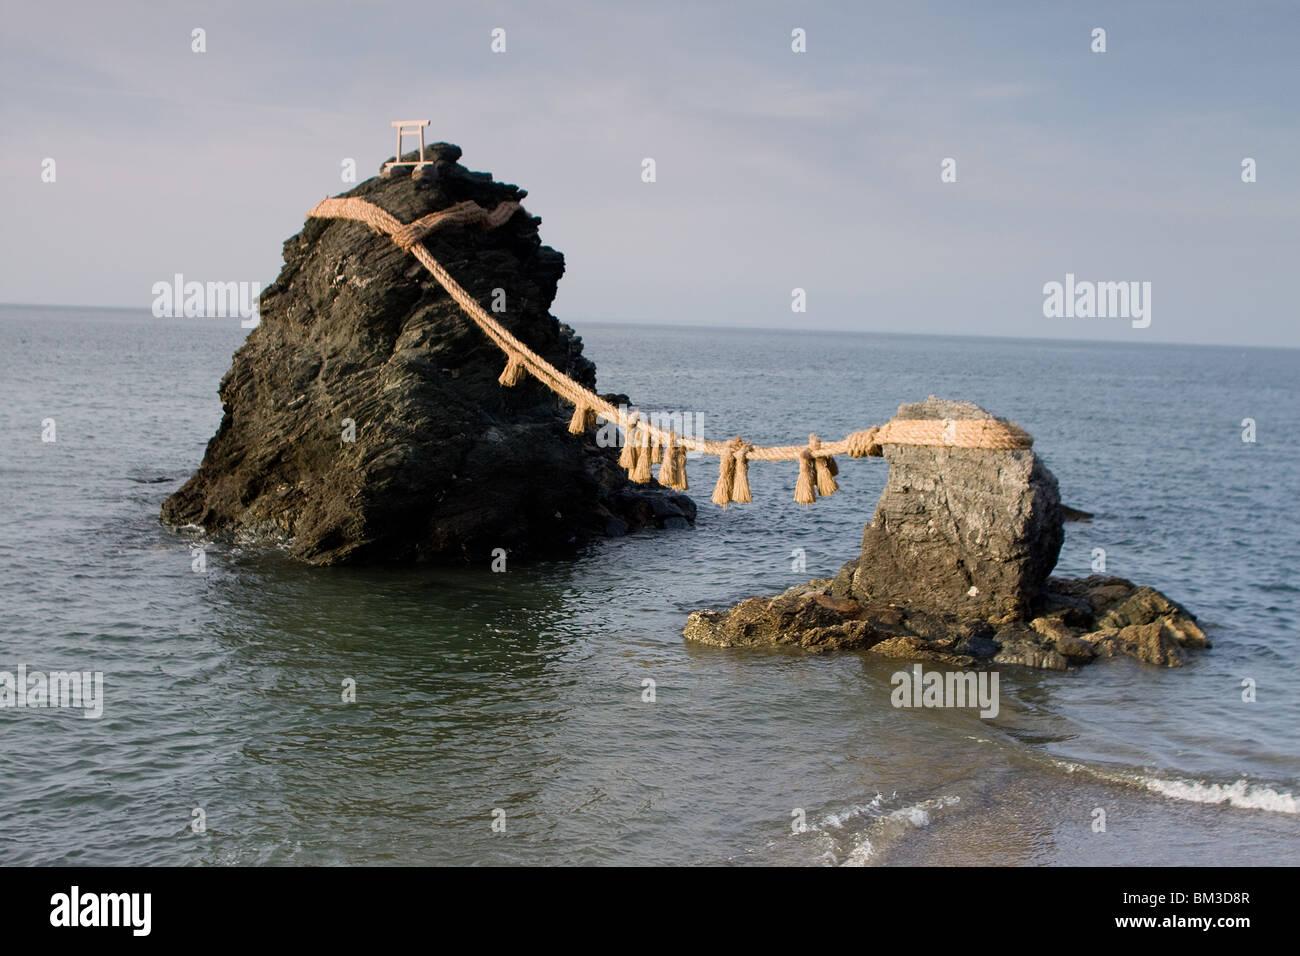 Meoto Iwa, the wedded rocks in Futami, Japan - Stock Image